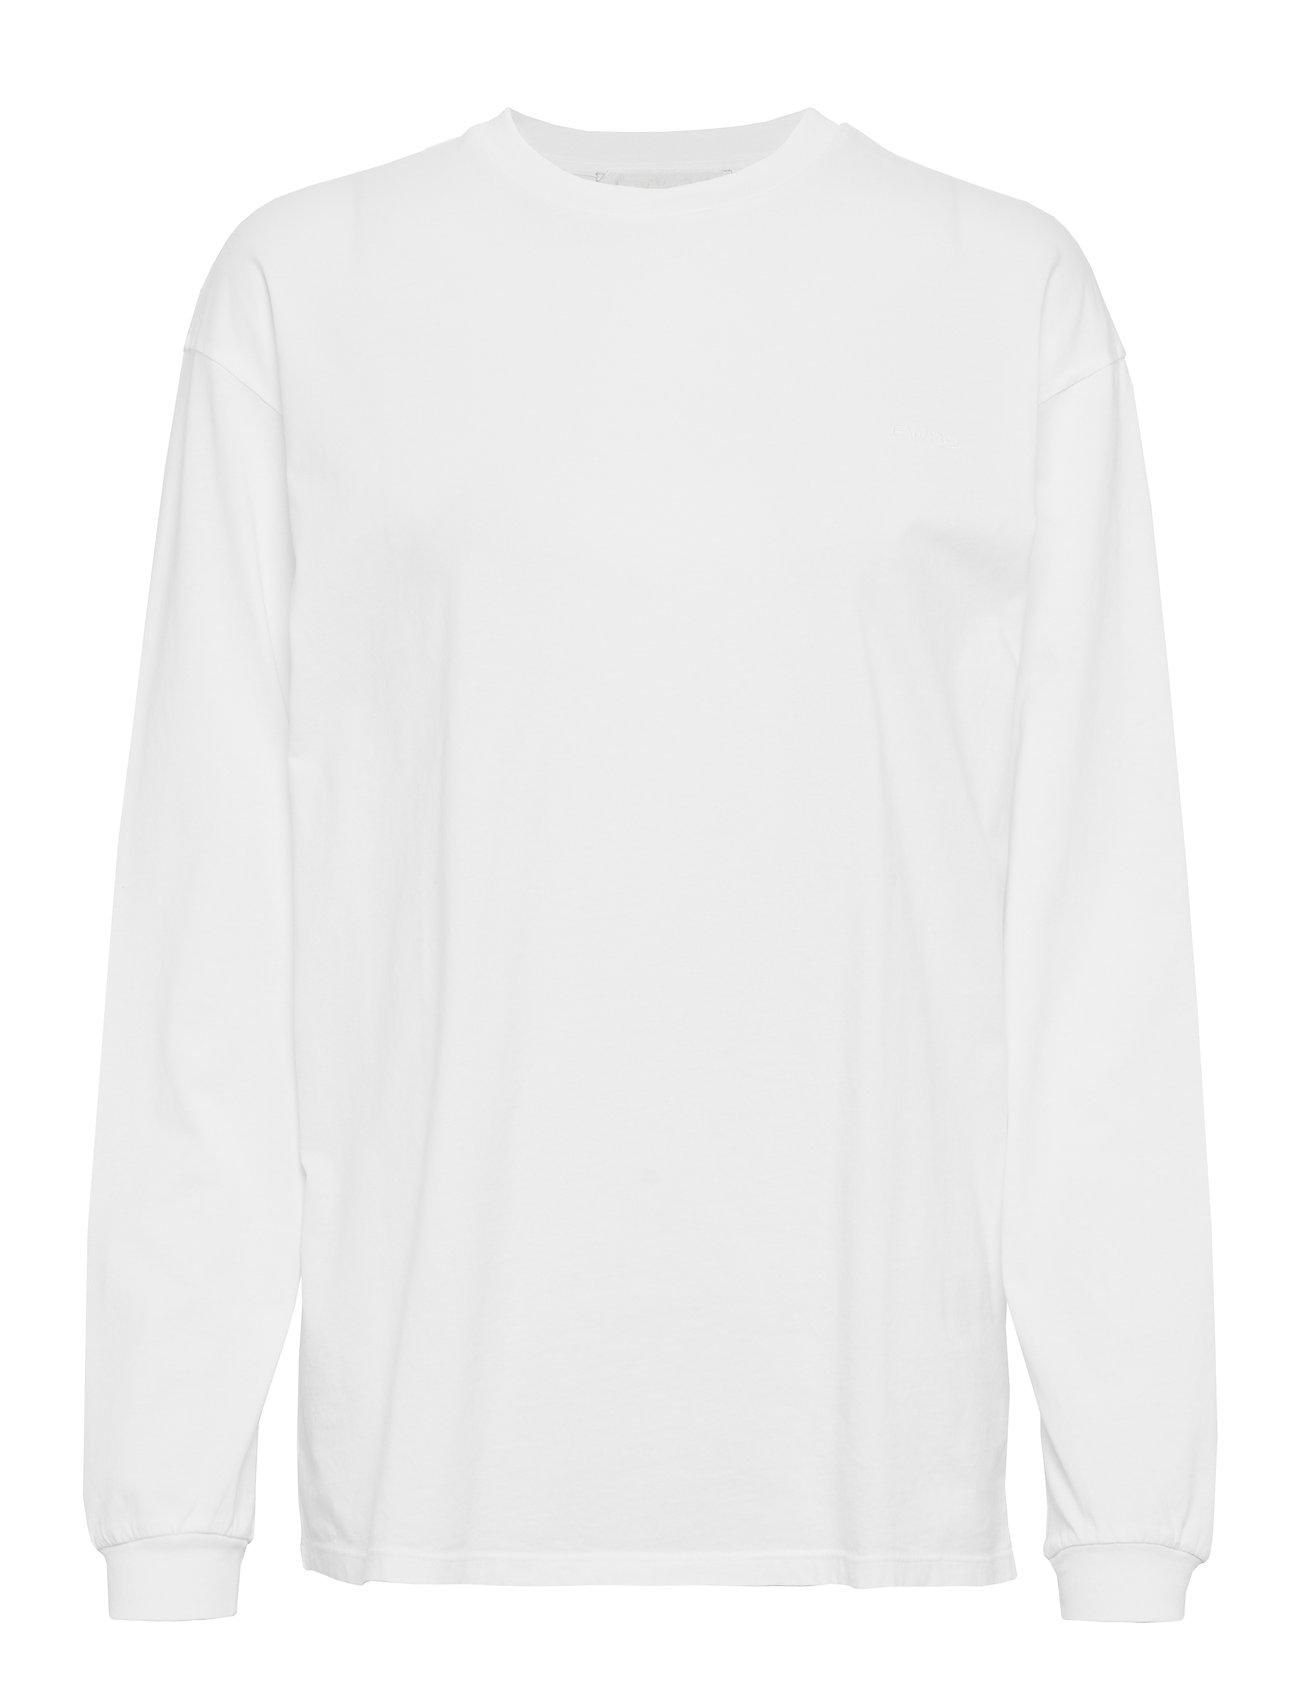 Fall Winter Spring Summer Kelly T-shirts & Tops Long-sleeved Valkoinen Fall Winter Spring Summer